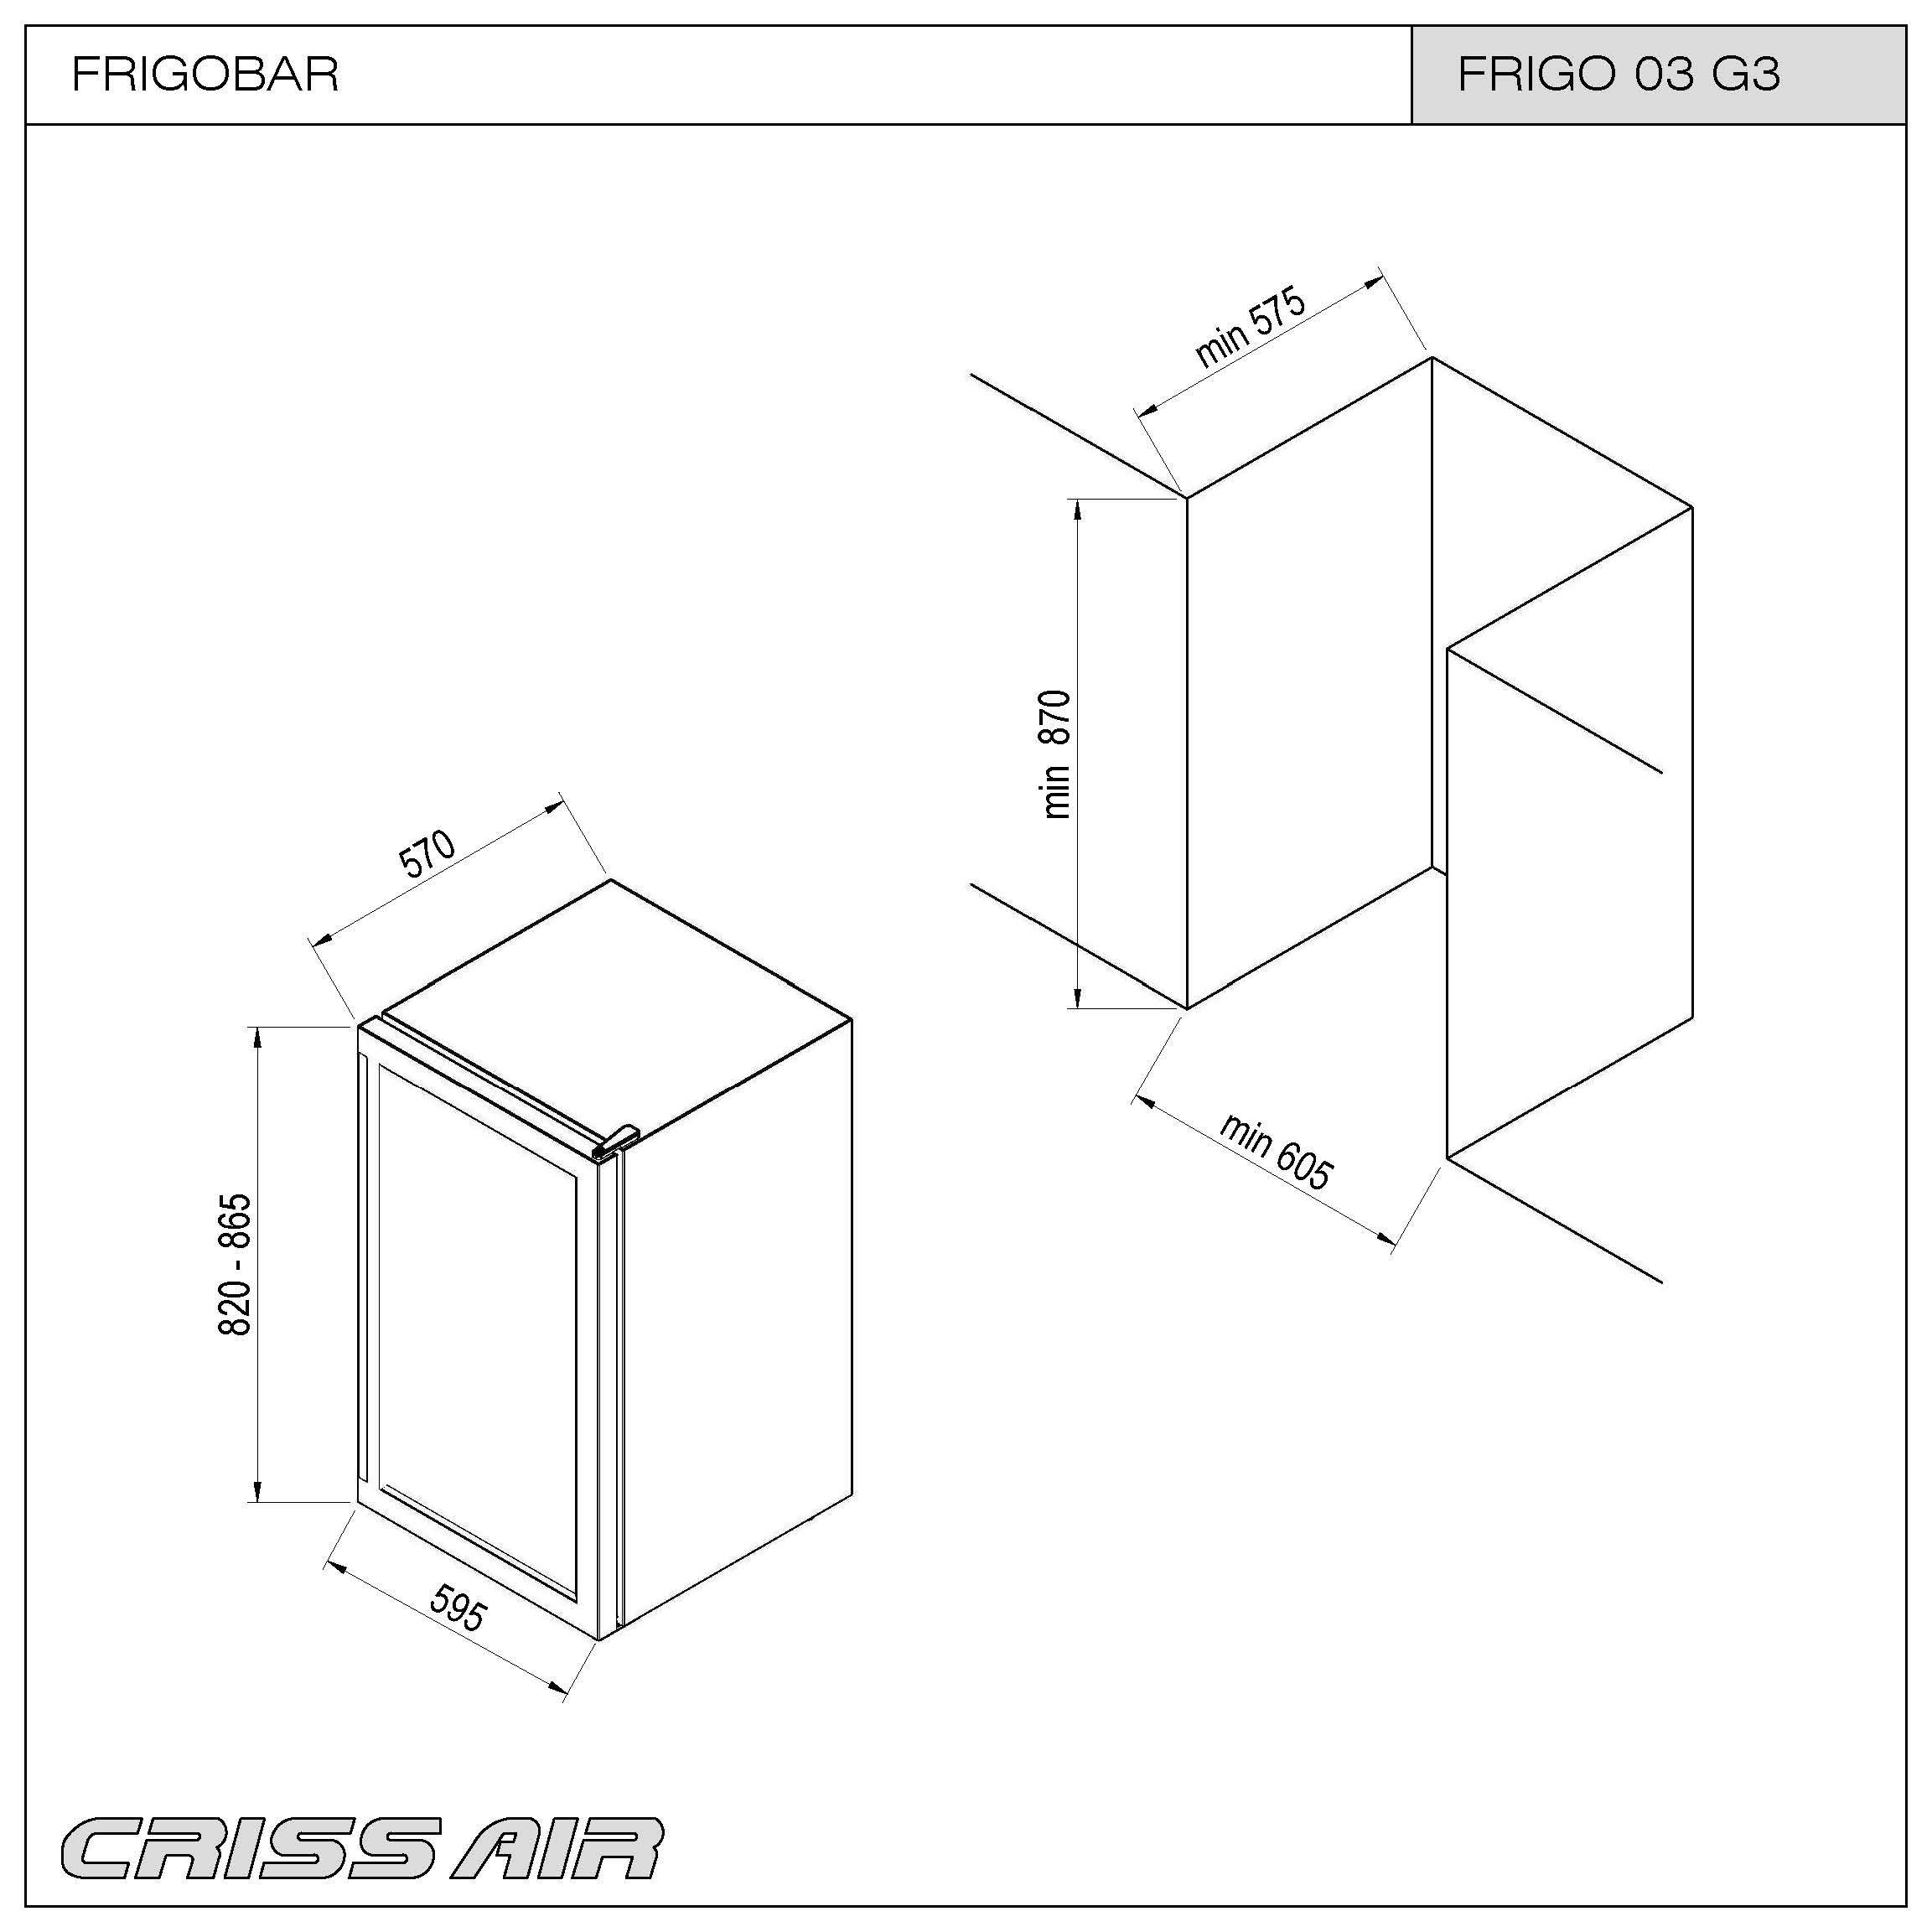 Frigobar FRIGO 03